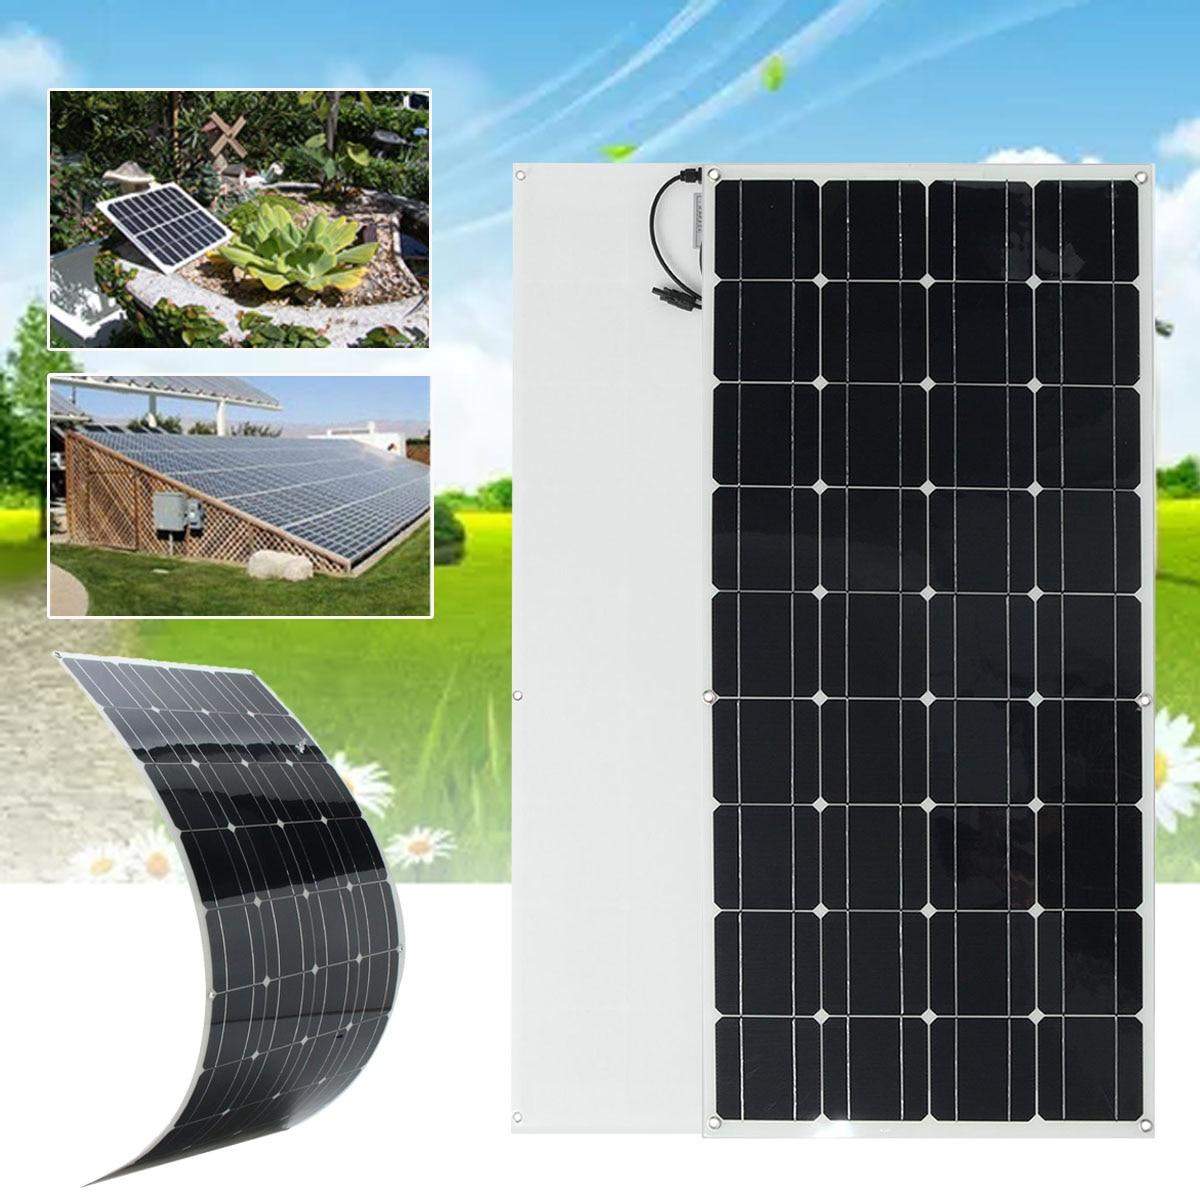 все цены на KINCO Flexible Solar Panel Kit 120W 18V Solar Charger 12V Car Battery Charger 12V Sunpower Monocrystalline Silicon Cells